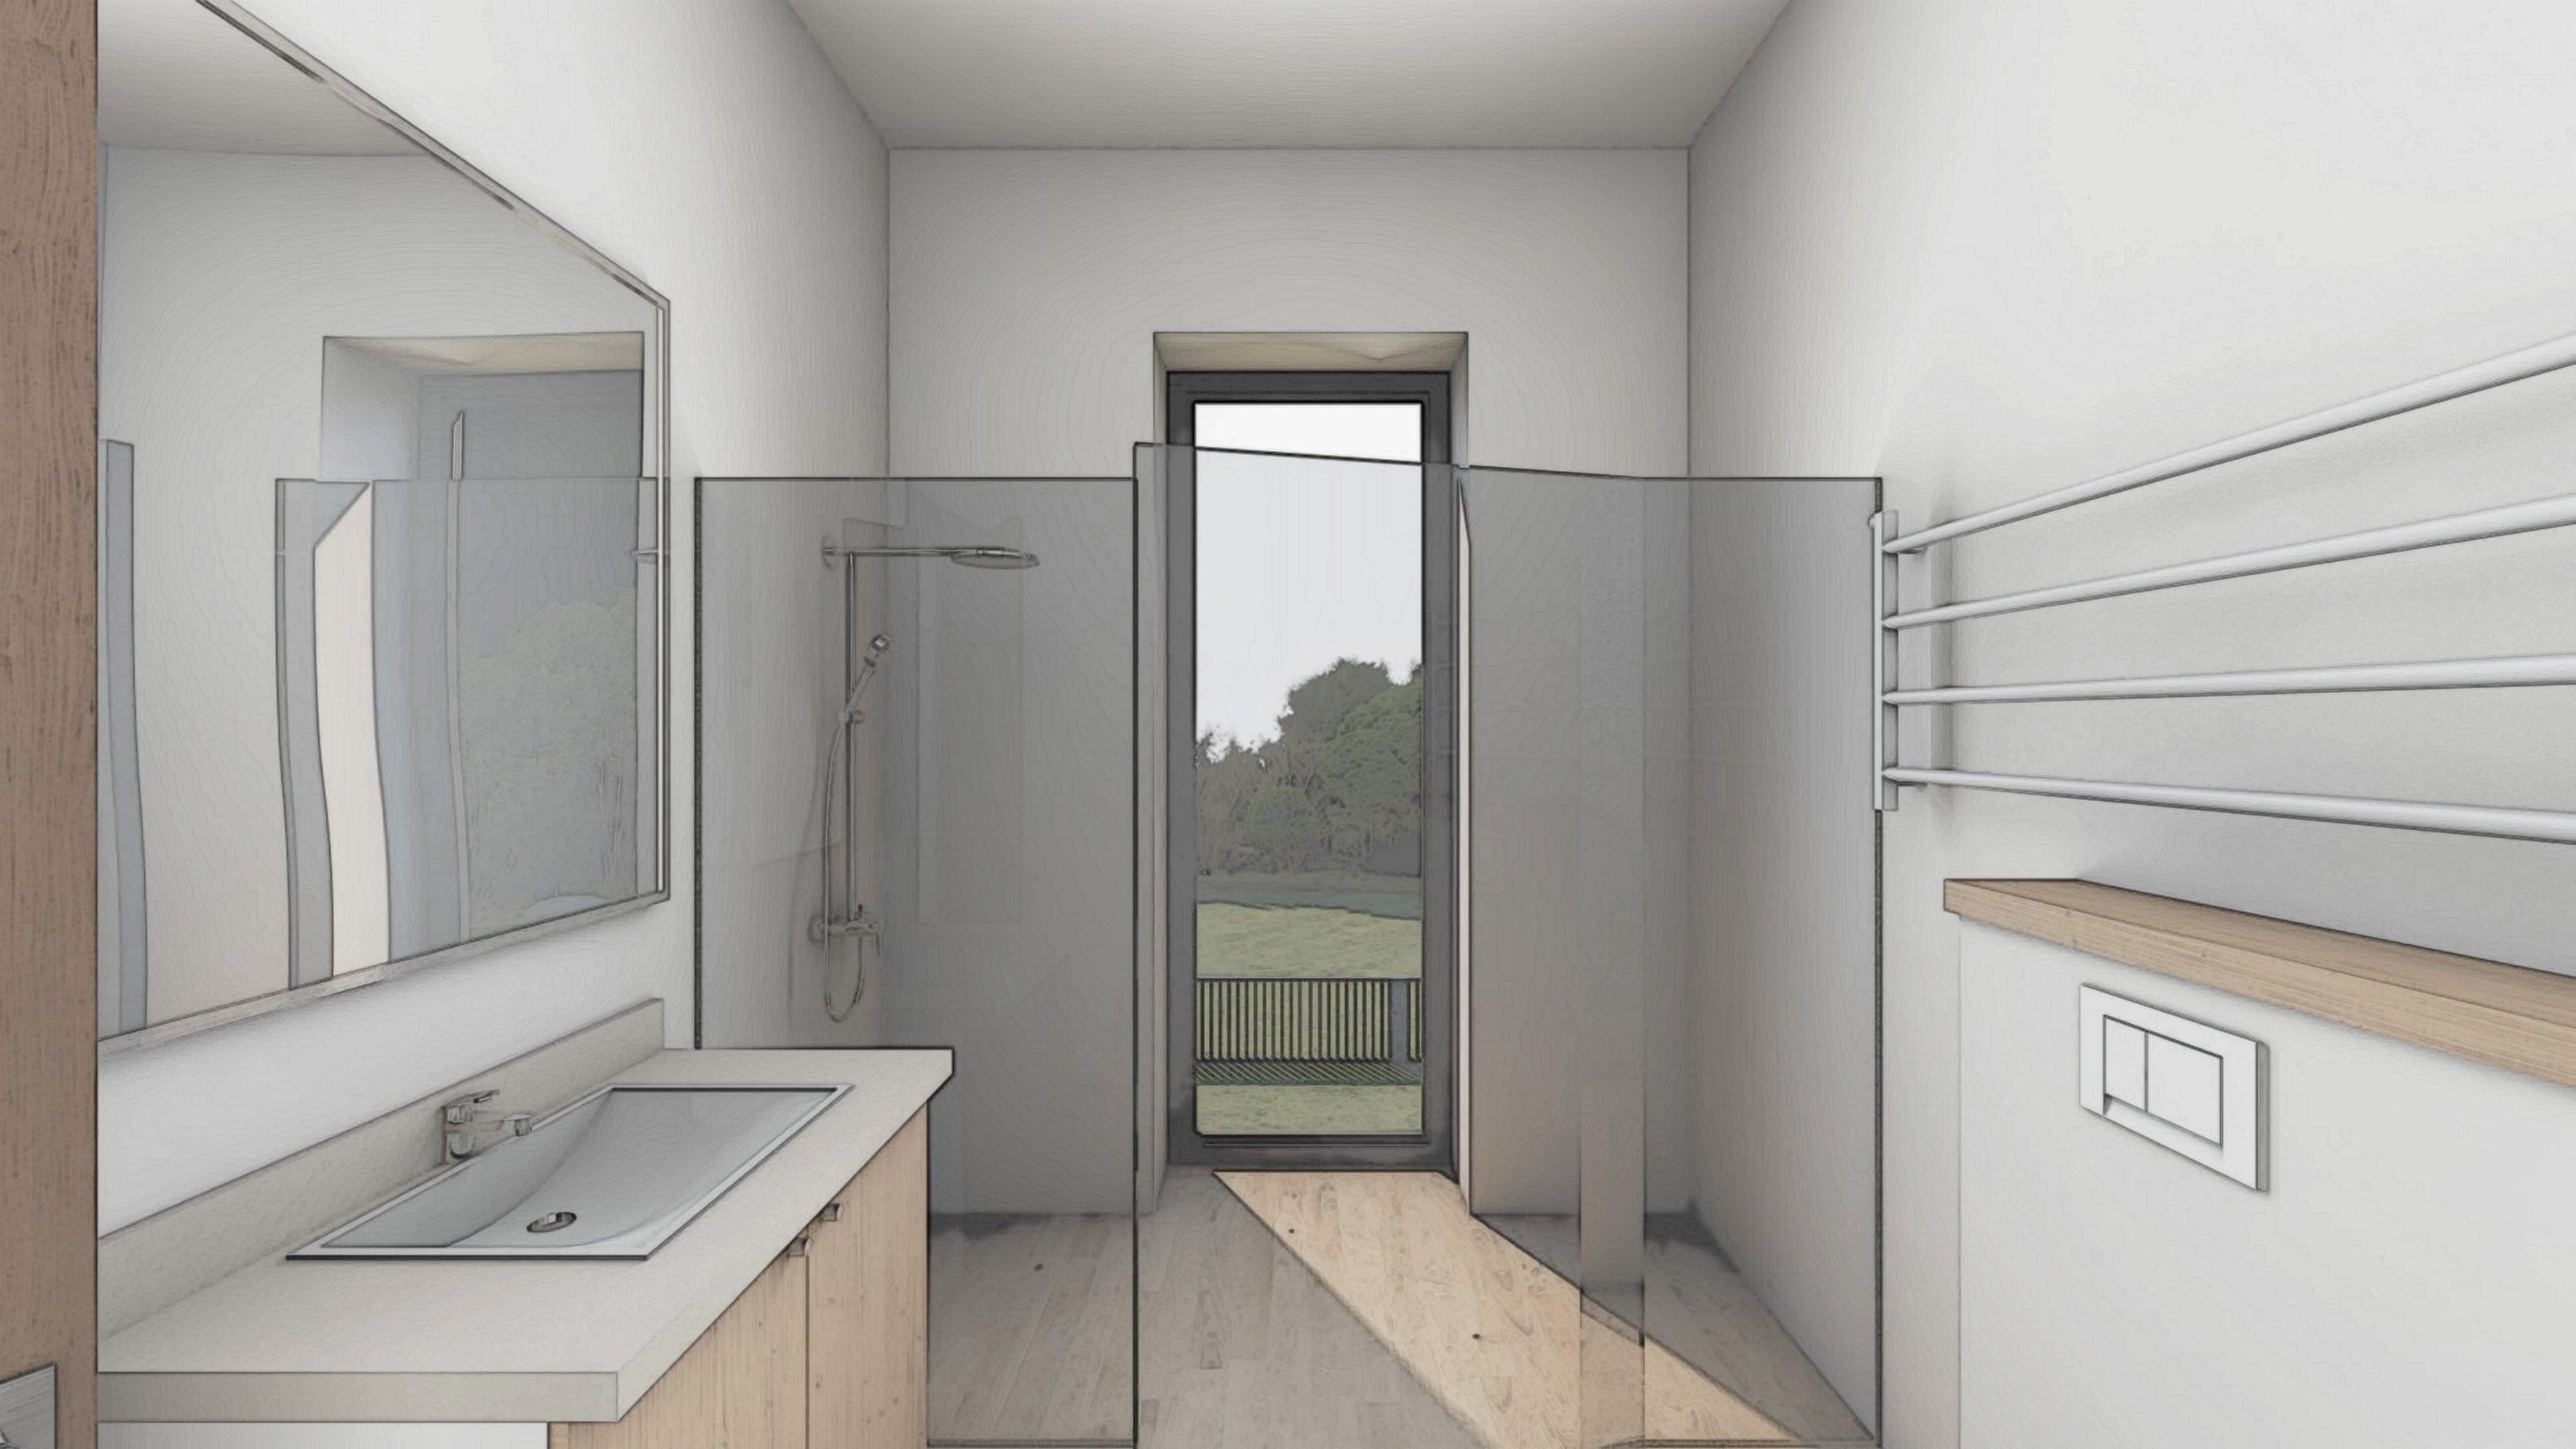 Изображение для проекта Проект особняка в Латвии в стиле модерн 2905